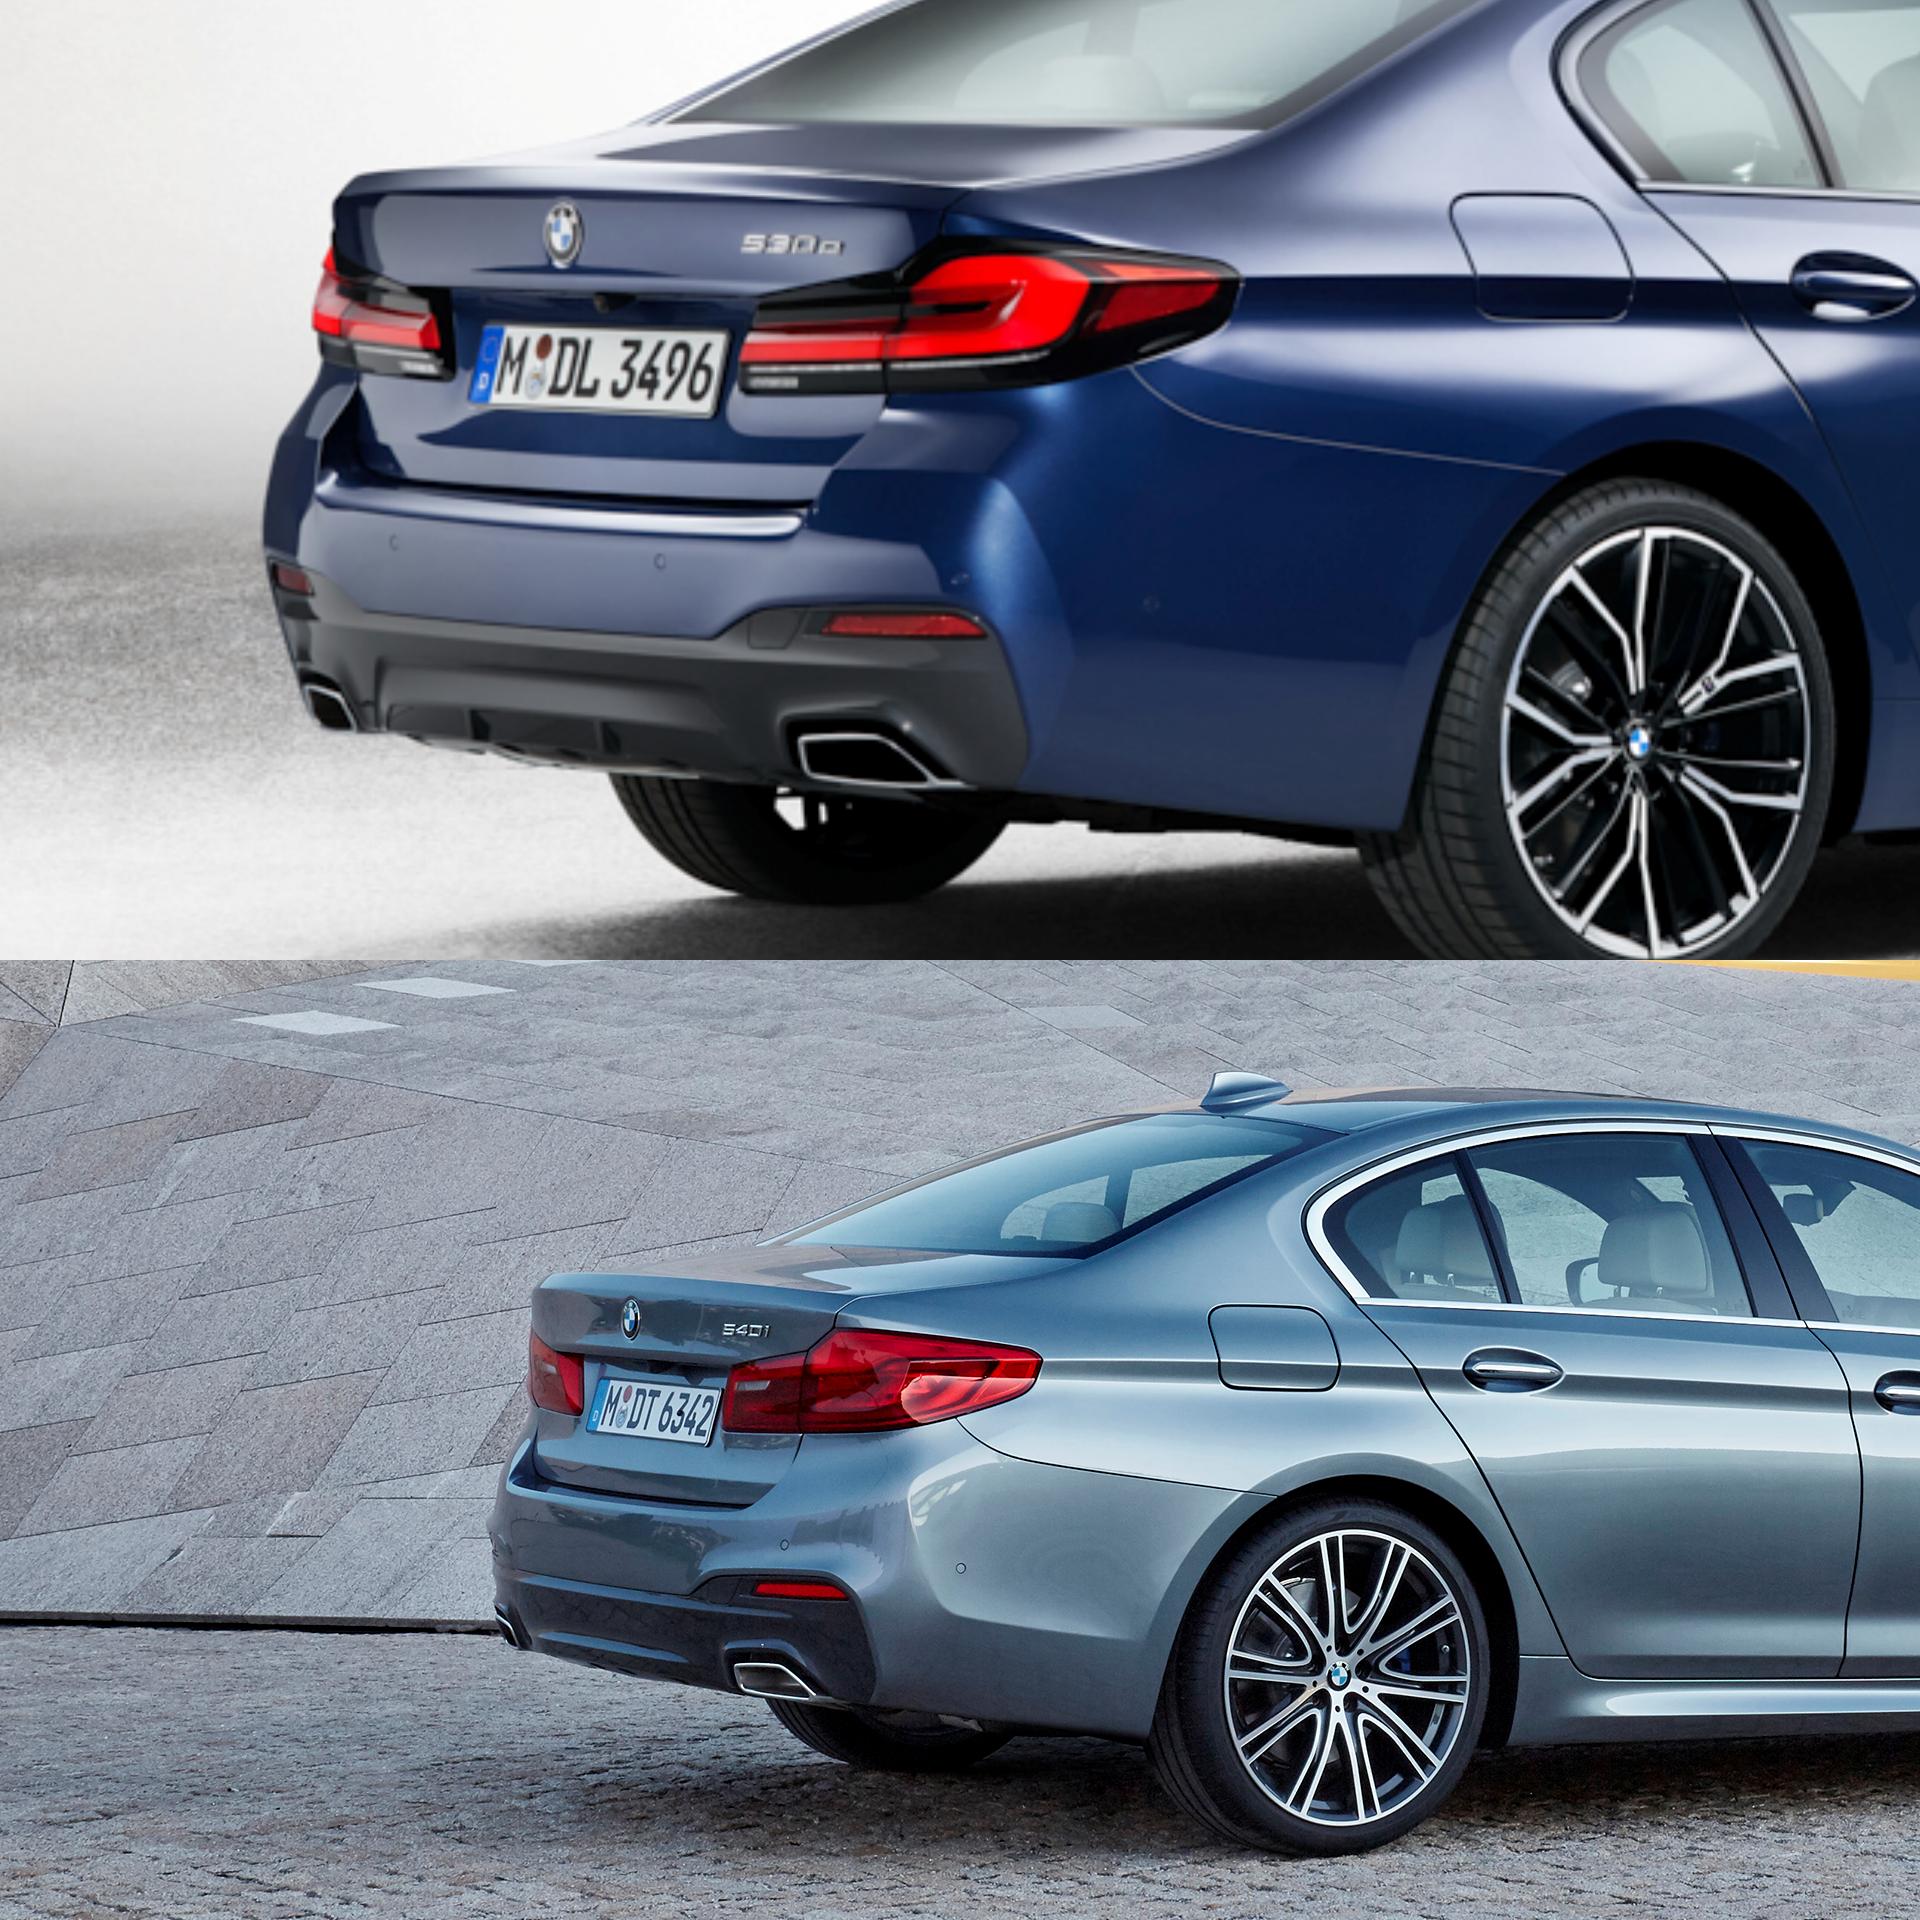 2021 BMW 5 Series LCI: A short comparison with the pre-LCI ...